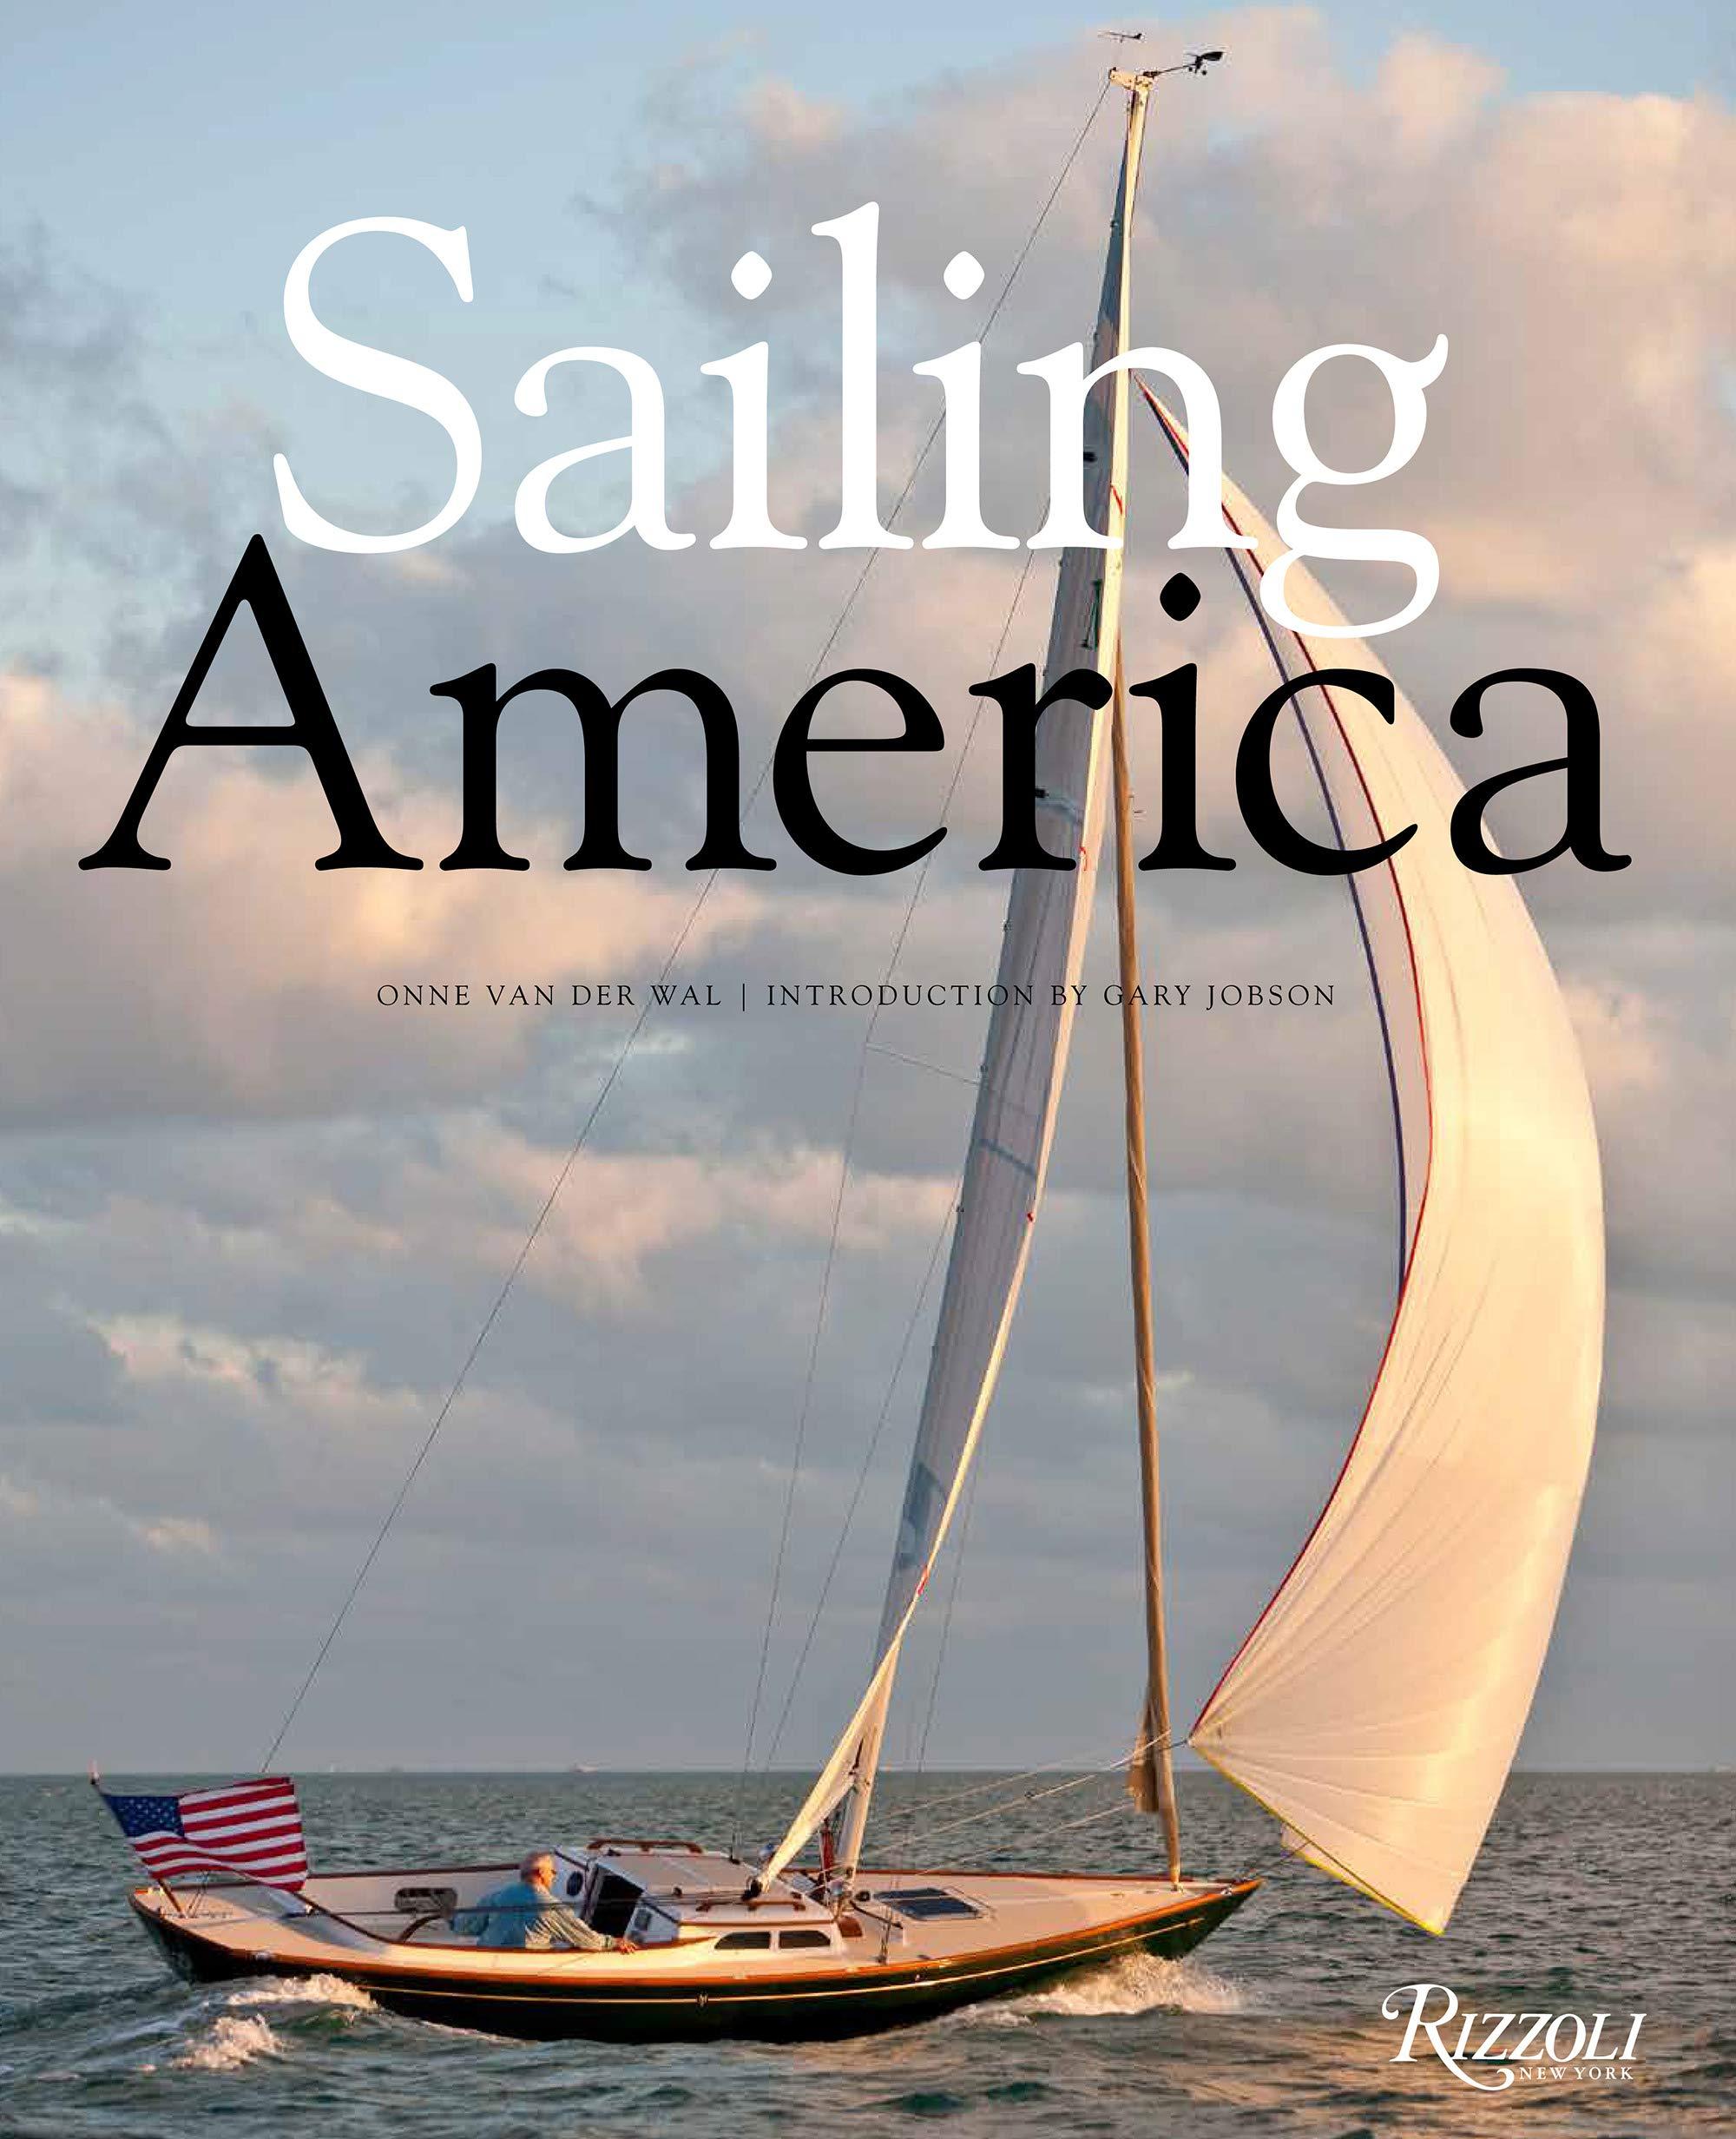 Sailing America by Rizzoli